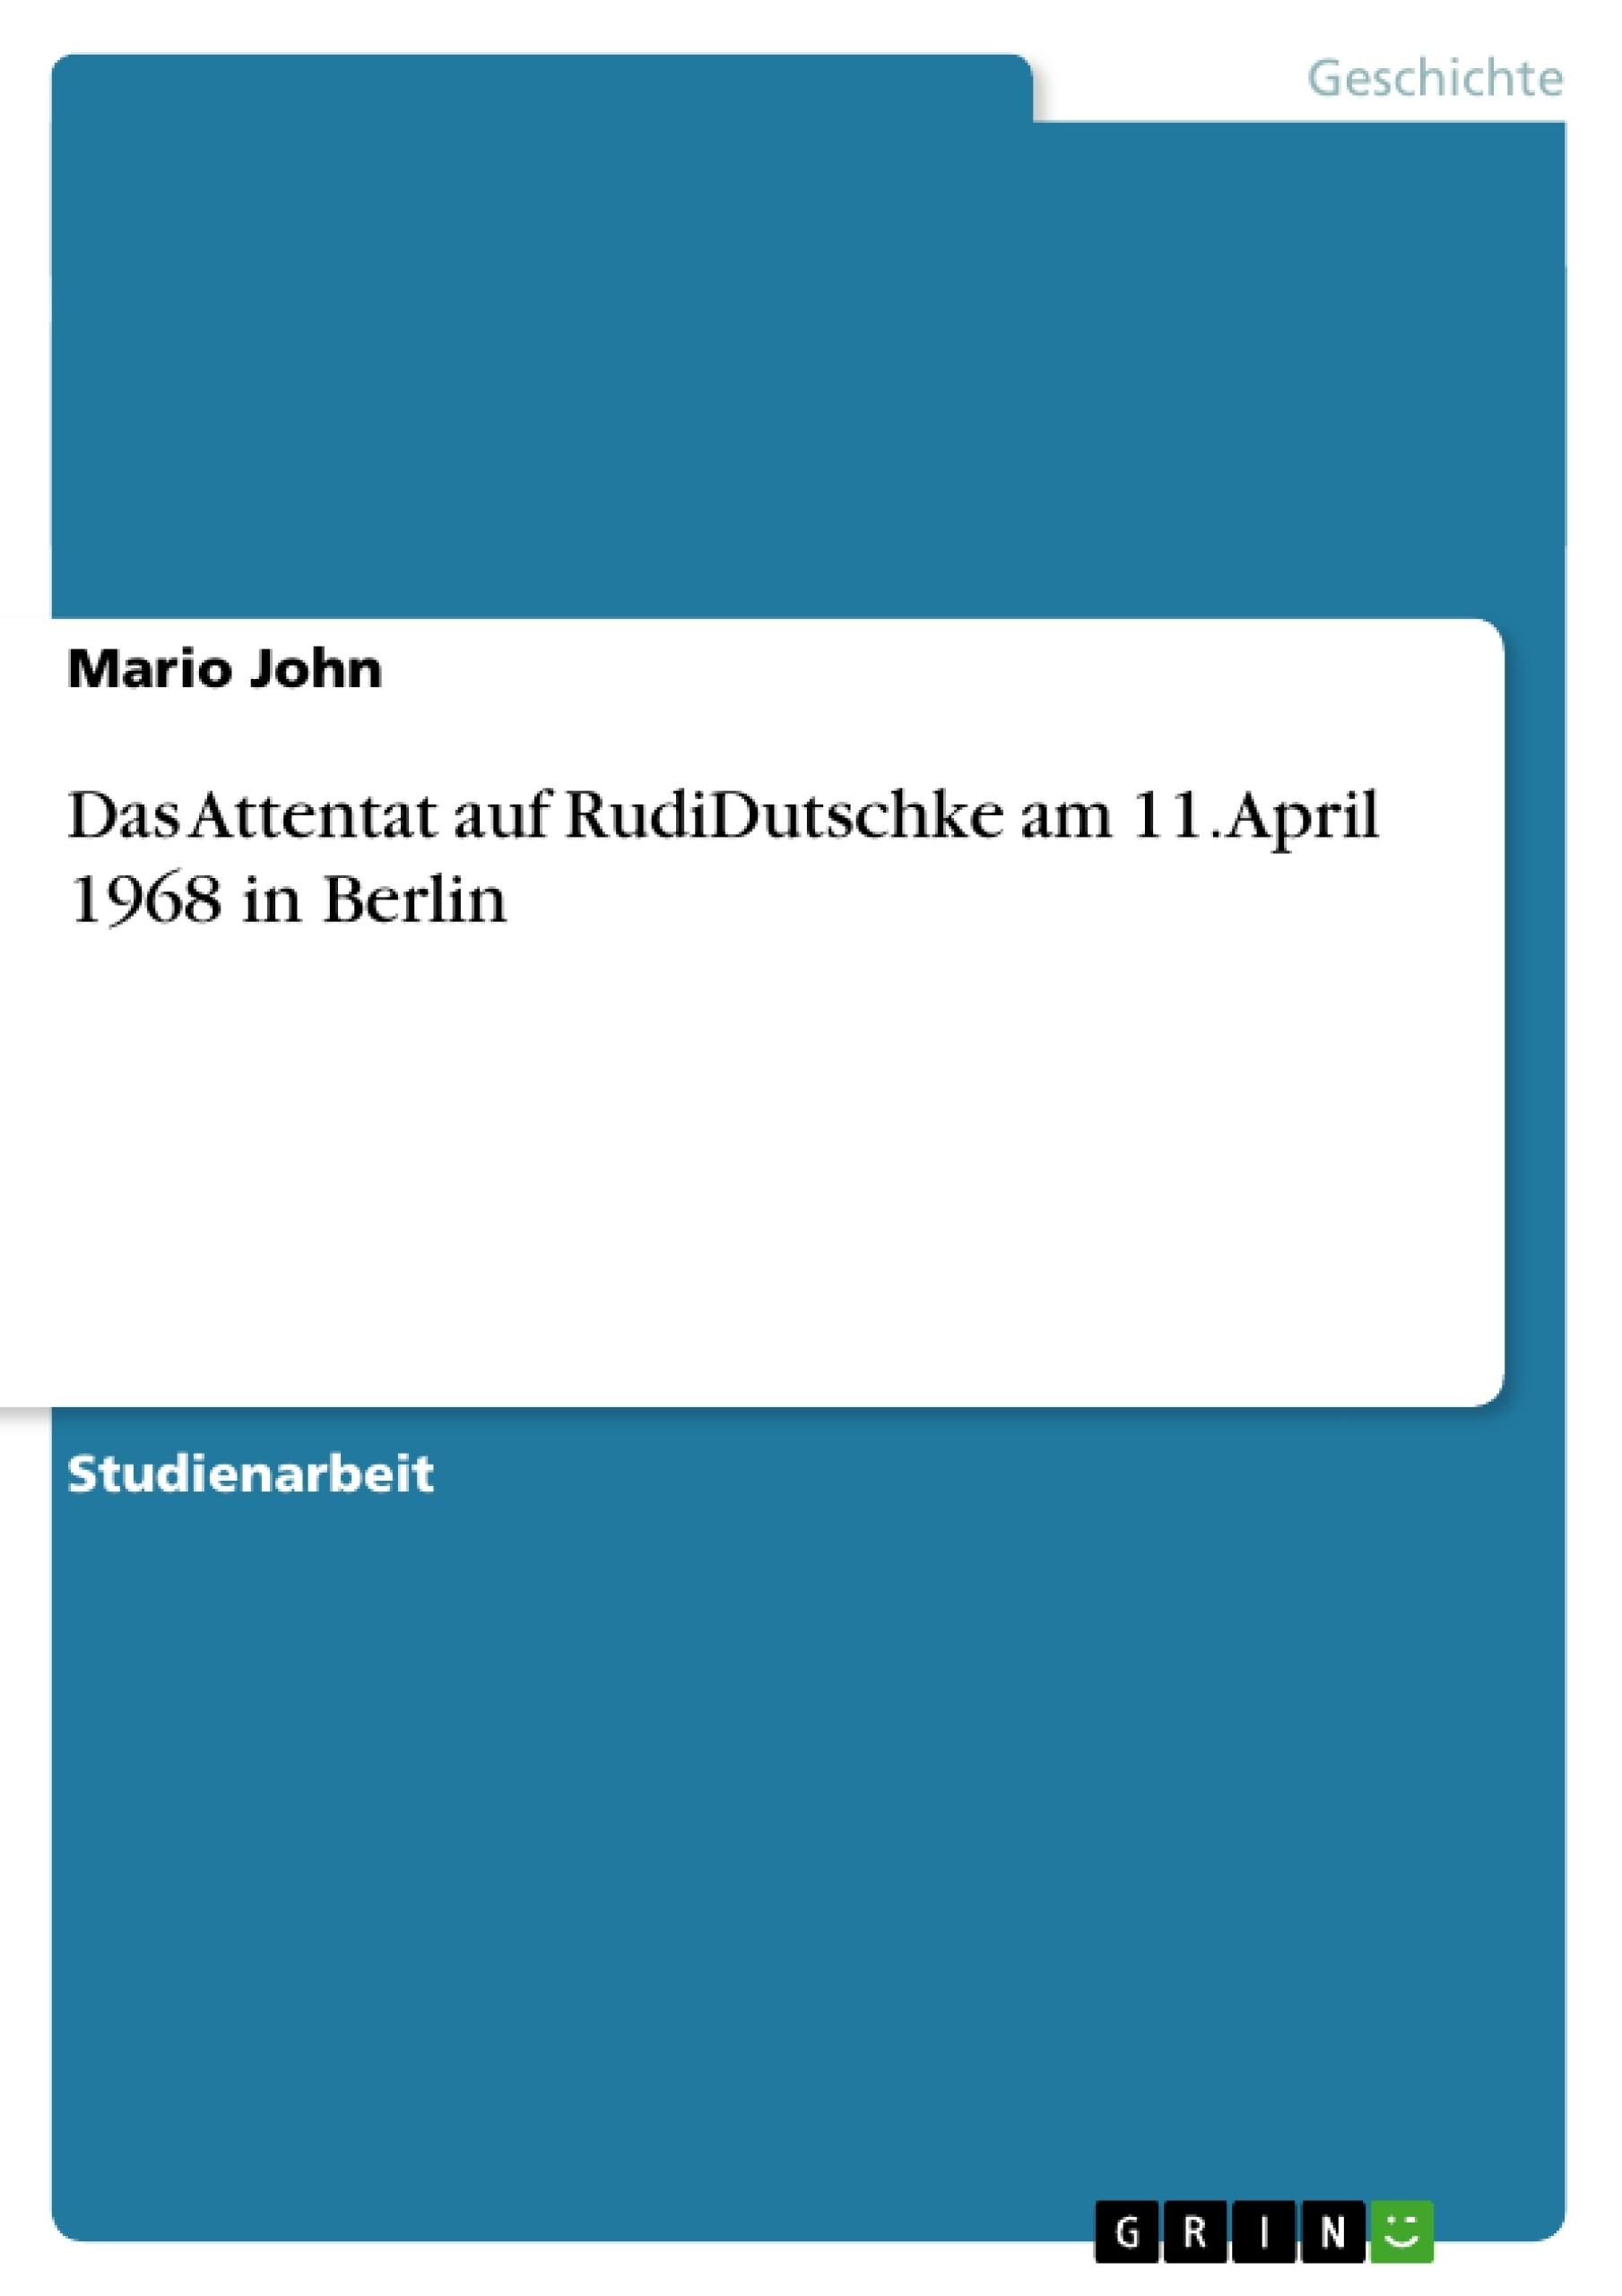 Titel: Das Attentat auf RudiDutschke am 11.April 1968 in Berlin